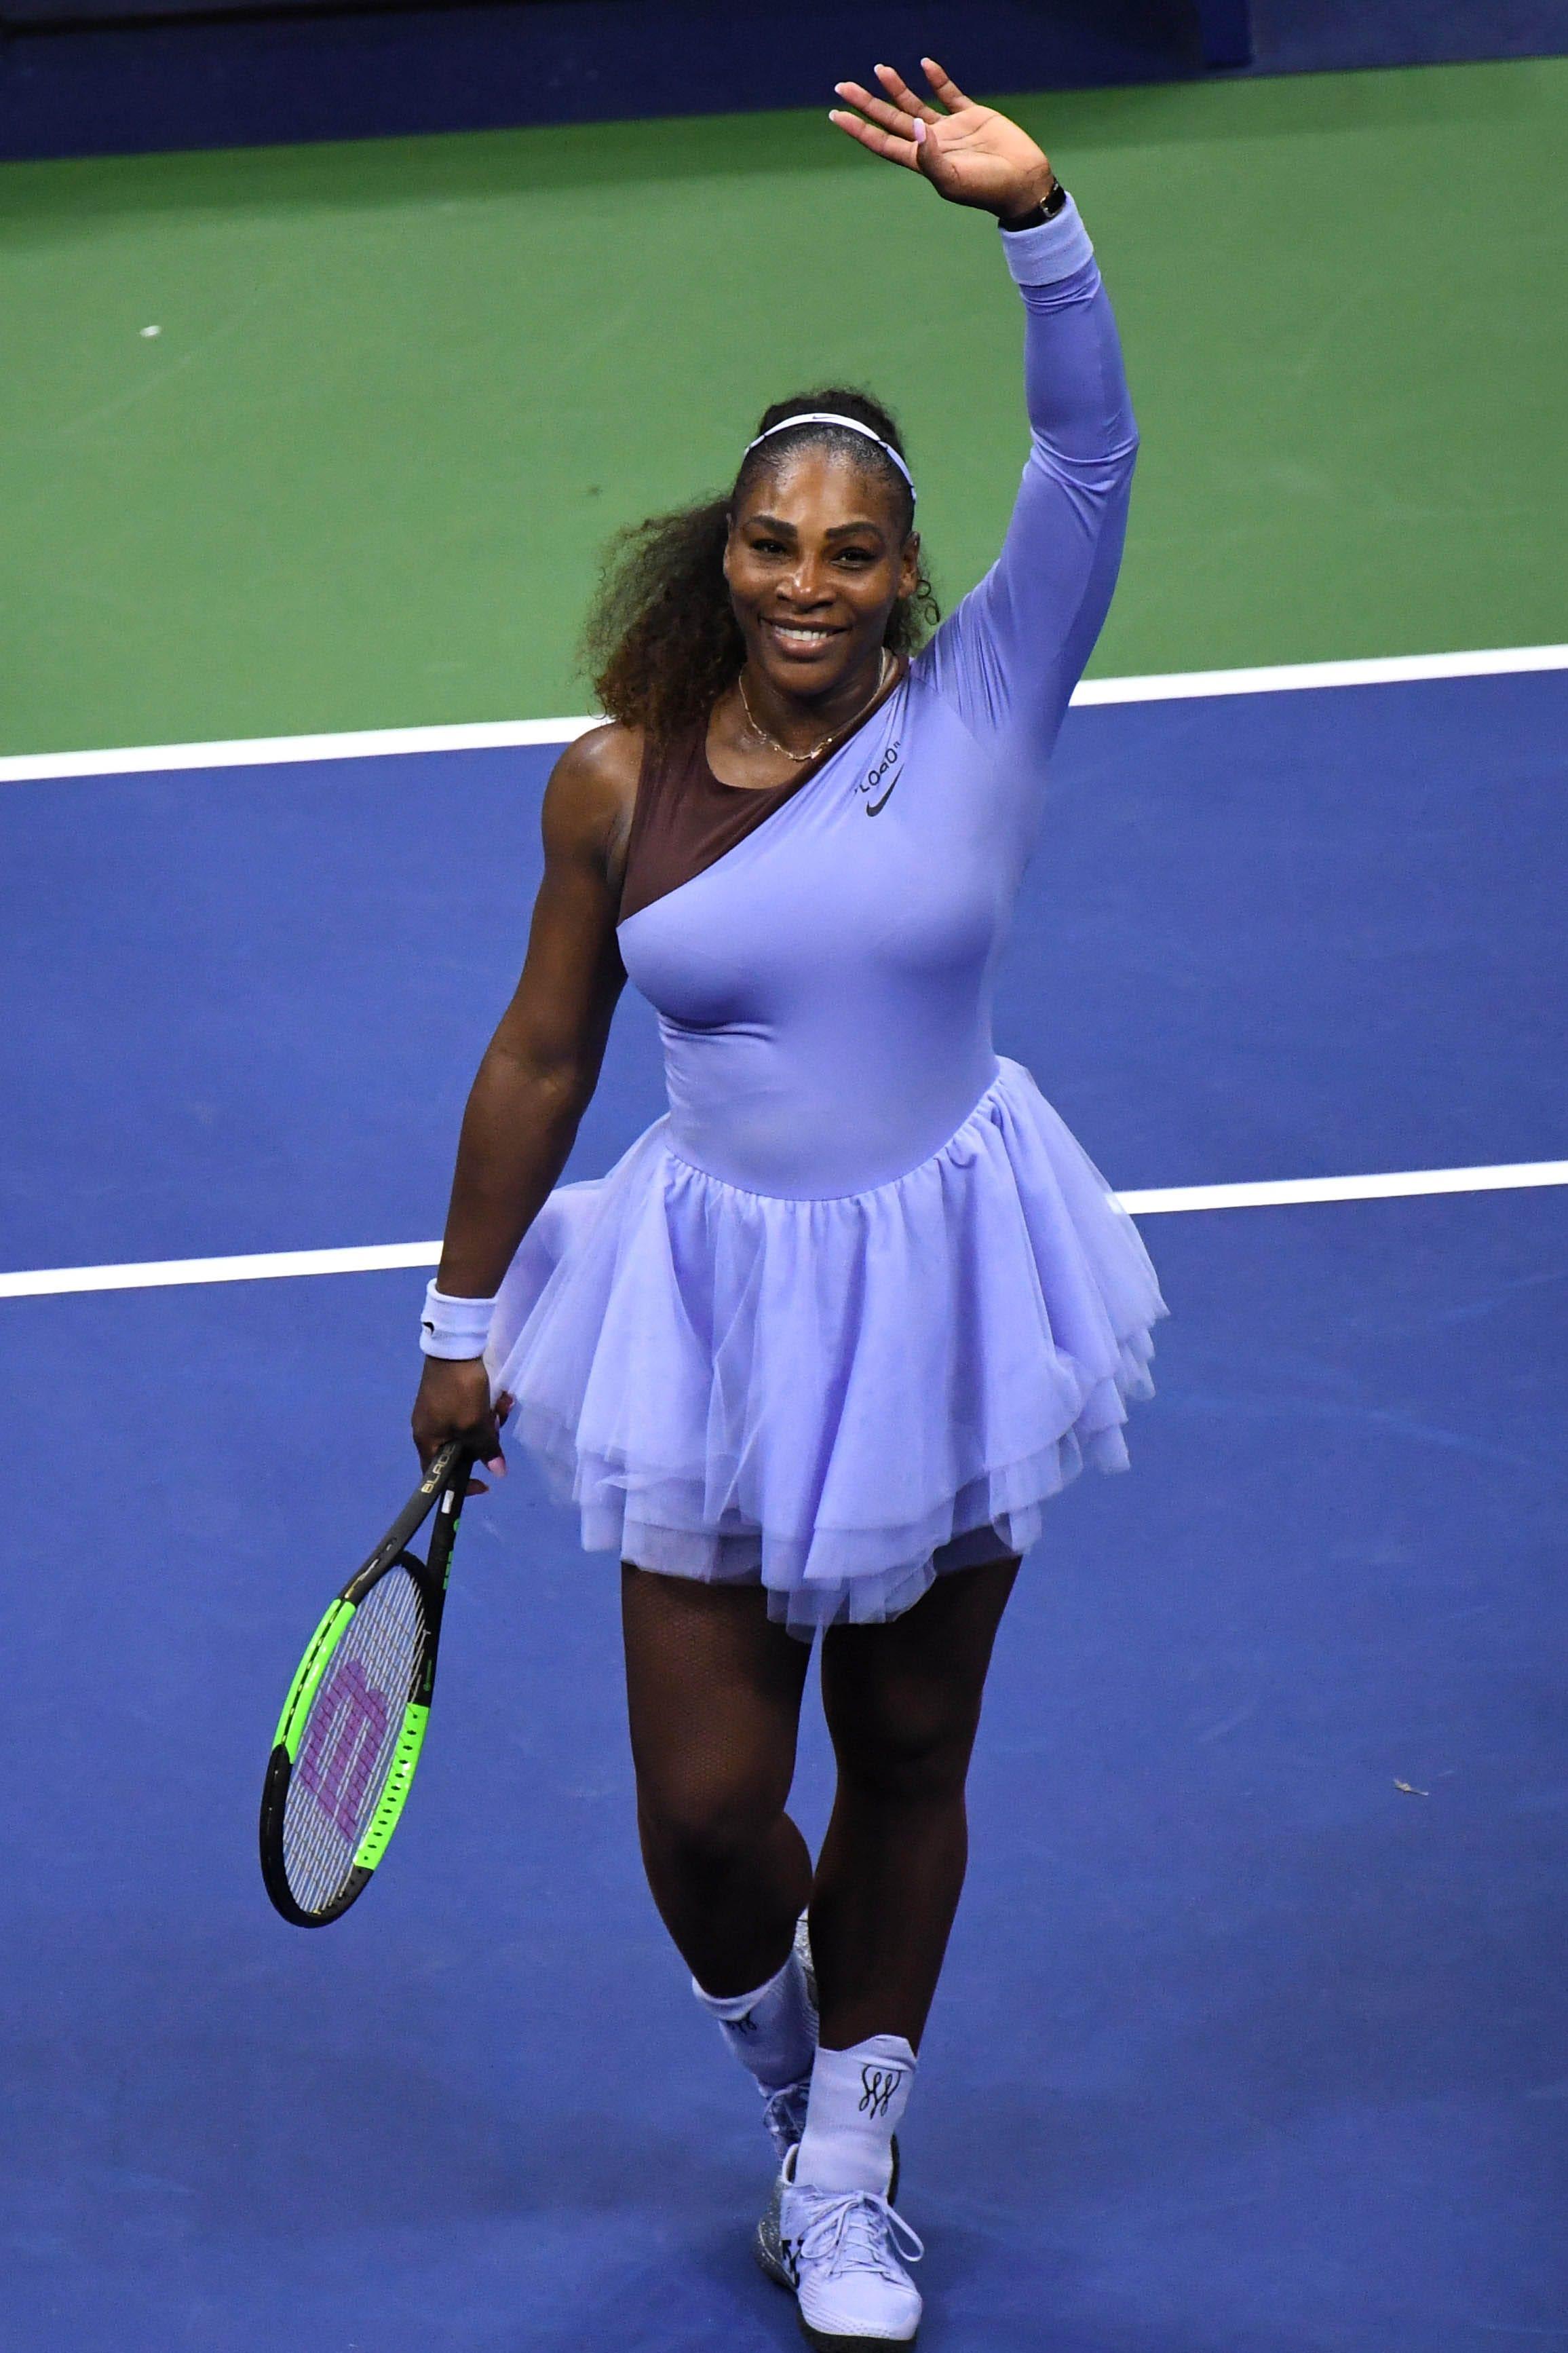 Watch Margaret Court 24 Grand Slam singles titles (11 in open-era) video